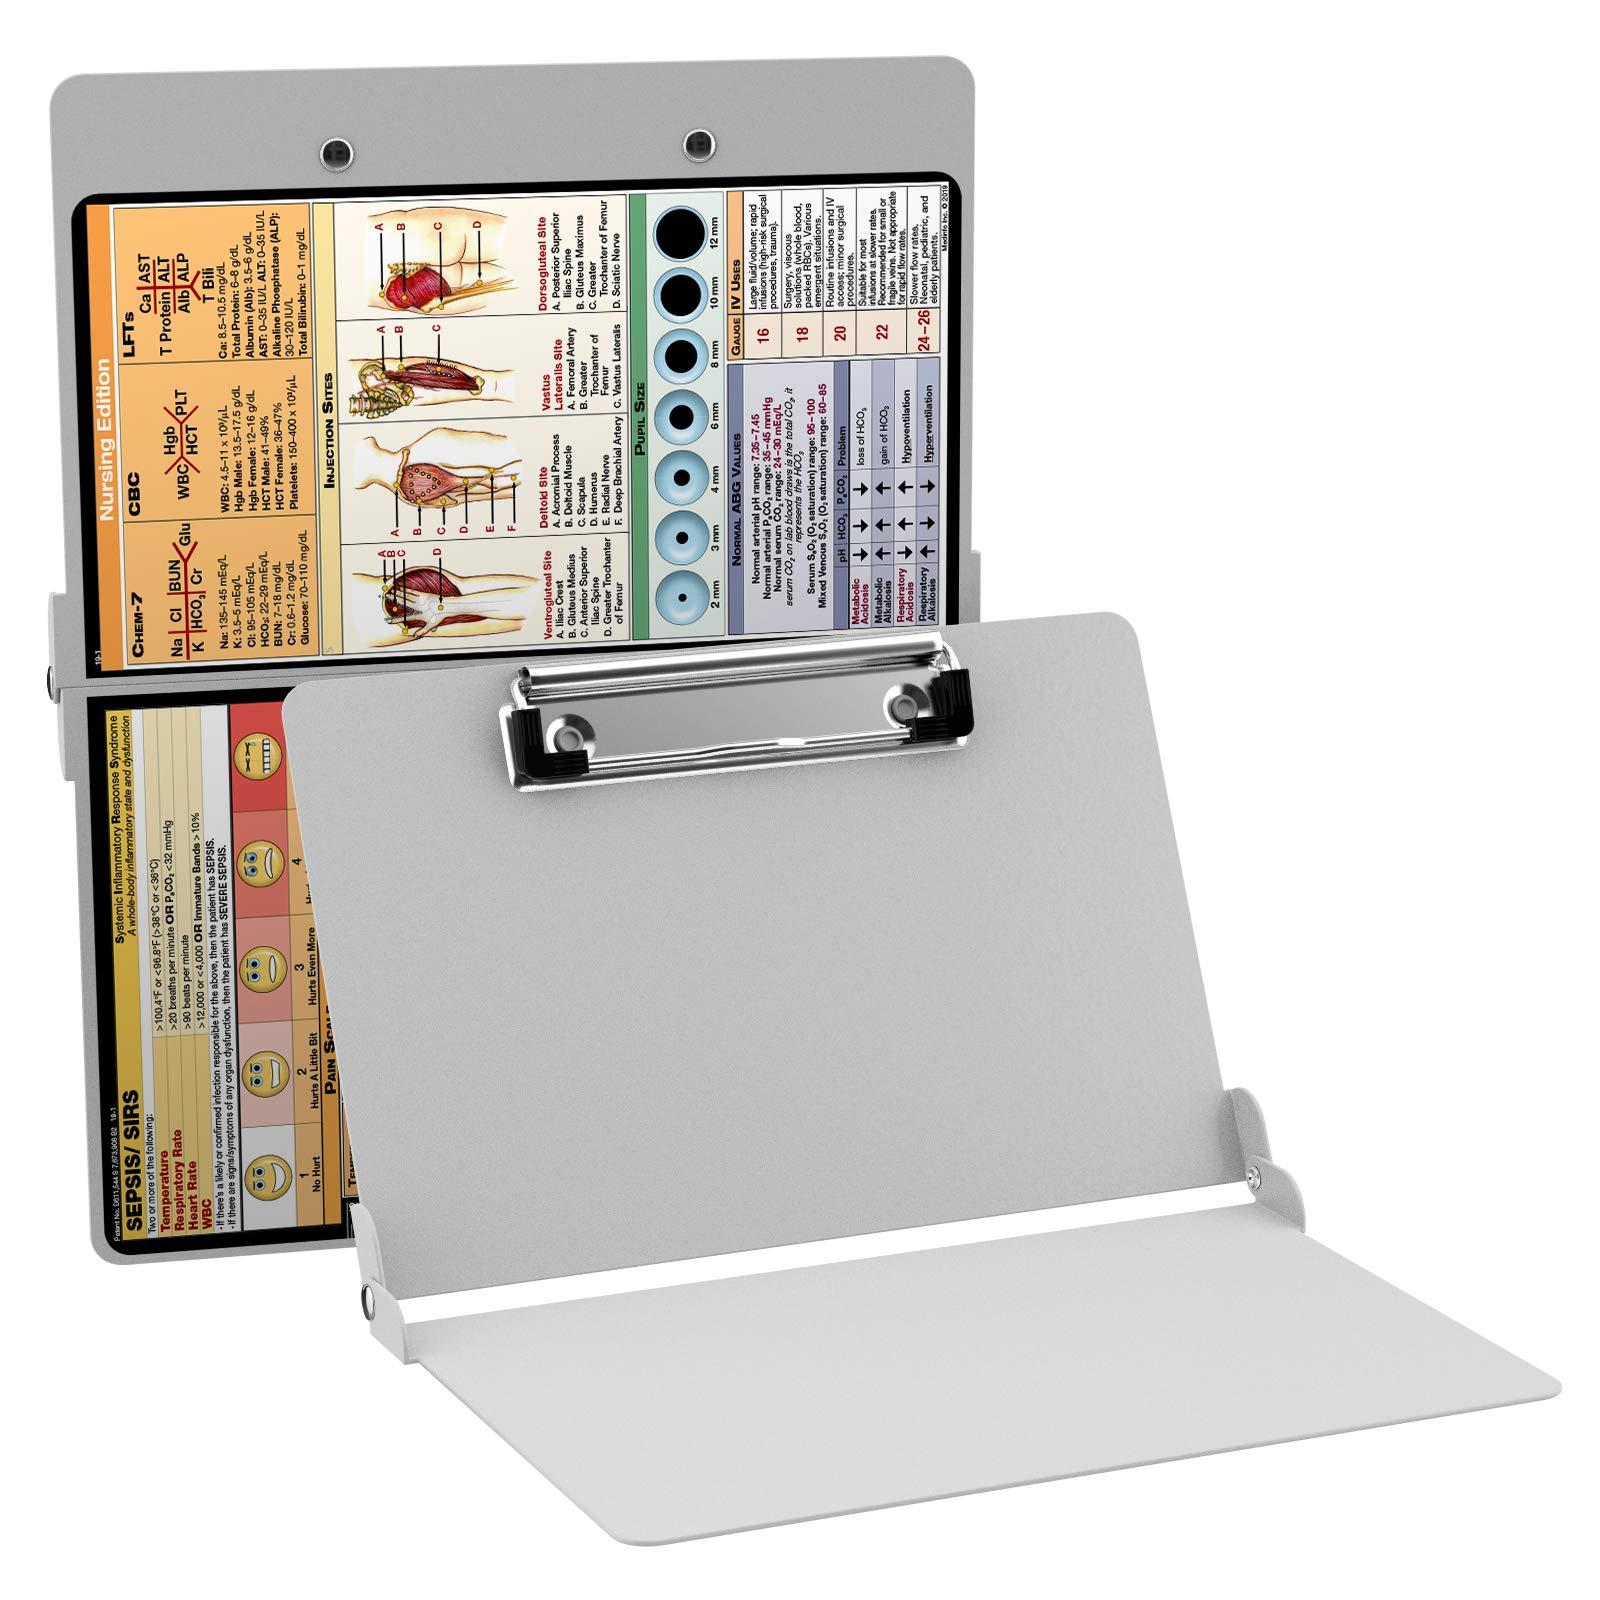 WhiteCoat Clipboard- White - Nursing Edition by WhiteCoat Clipboard